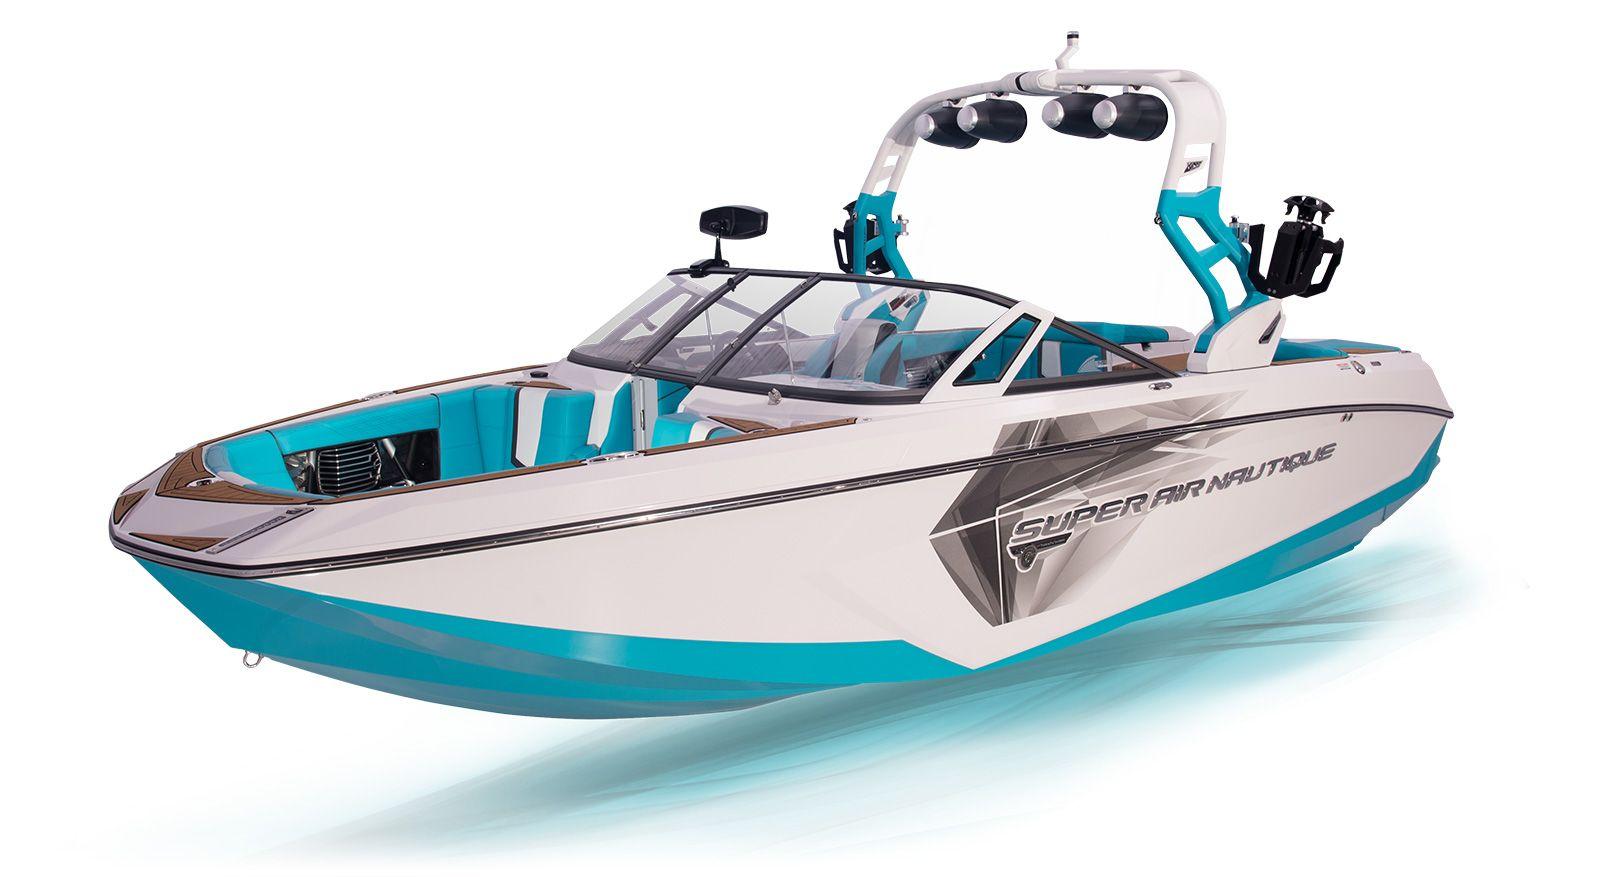 Super Air Nautique G23 3/4 left view Sport boats